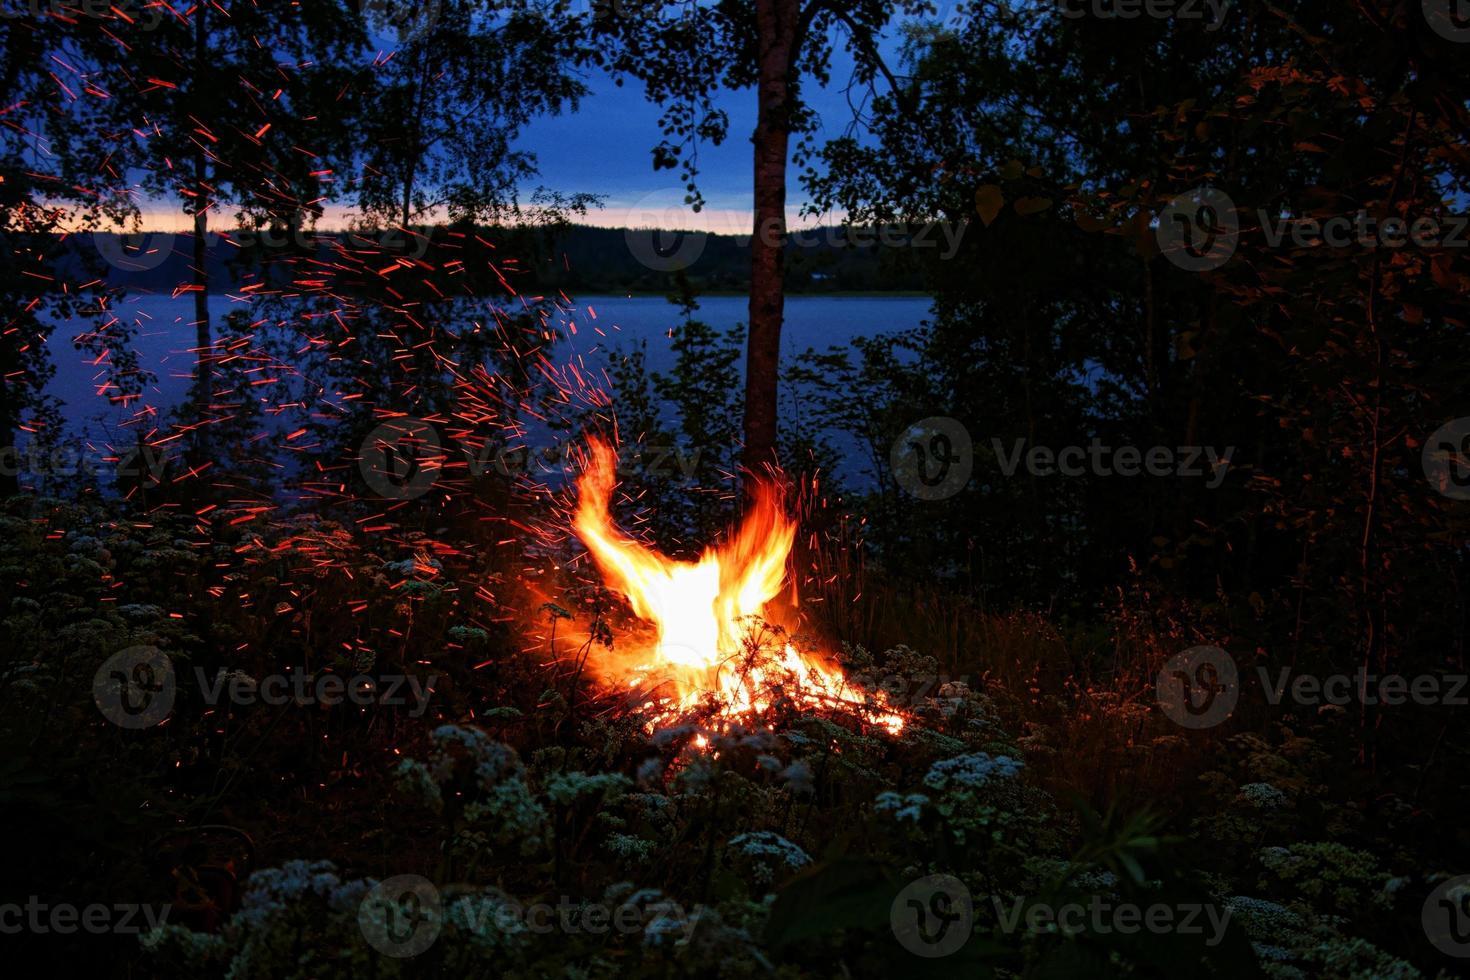 Feuervogelform Lagerfeuer foto